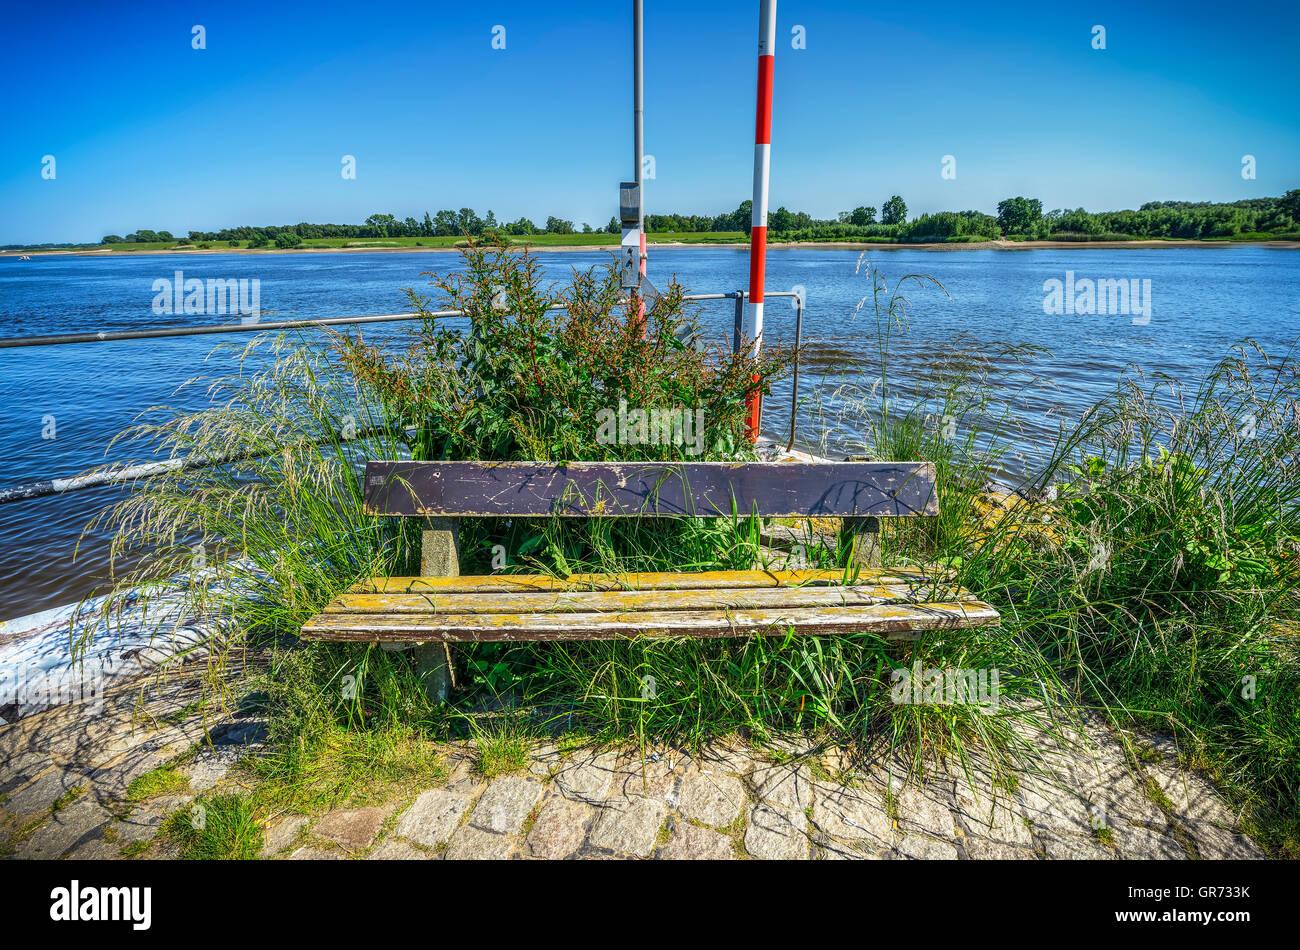 Bench At River Elbe In Hamburg, Germany - Stock Image